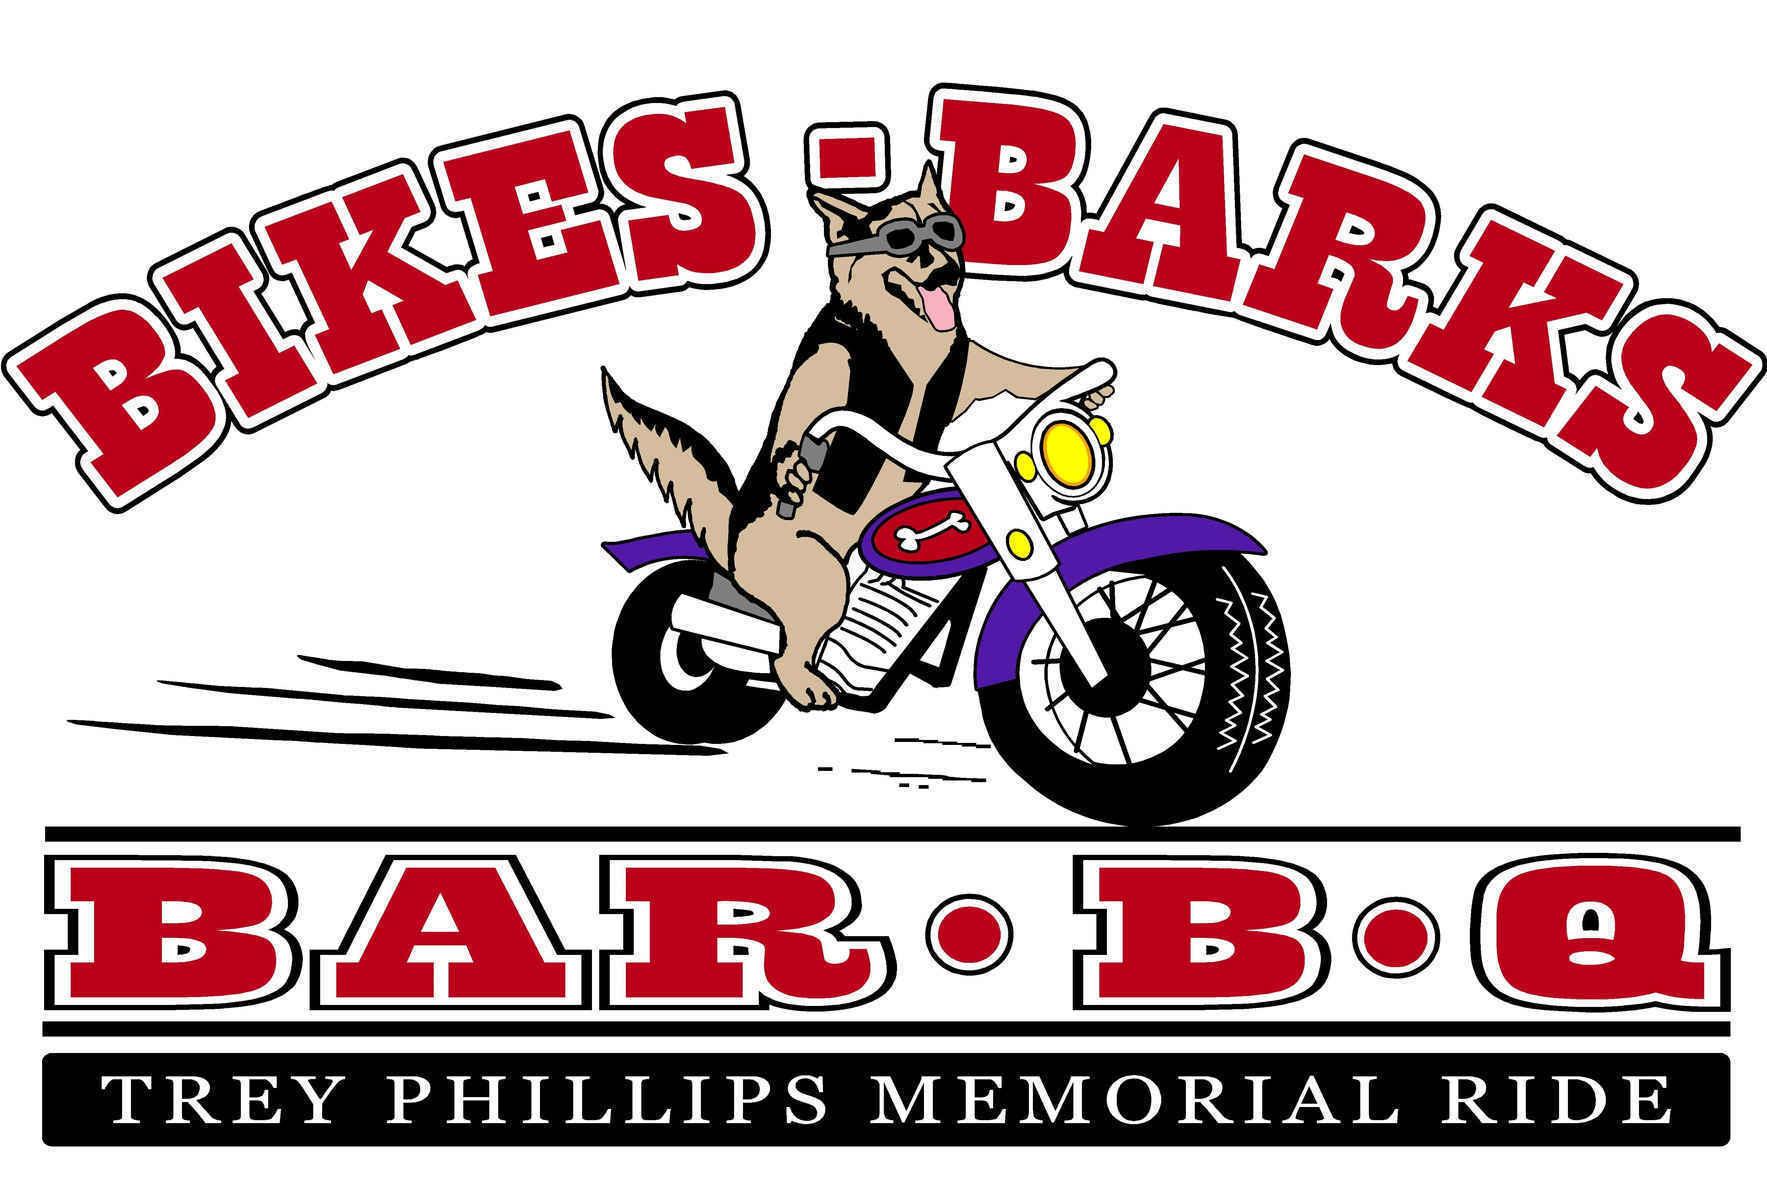 2019 Bikes Barks BBQ Vendor Booth Application Fee image